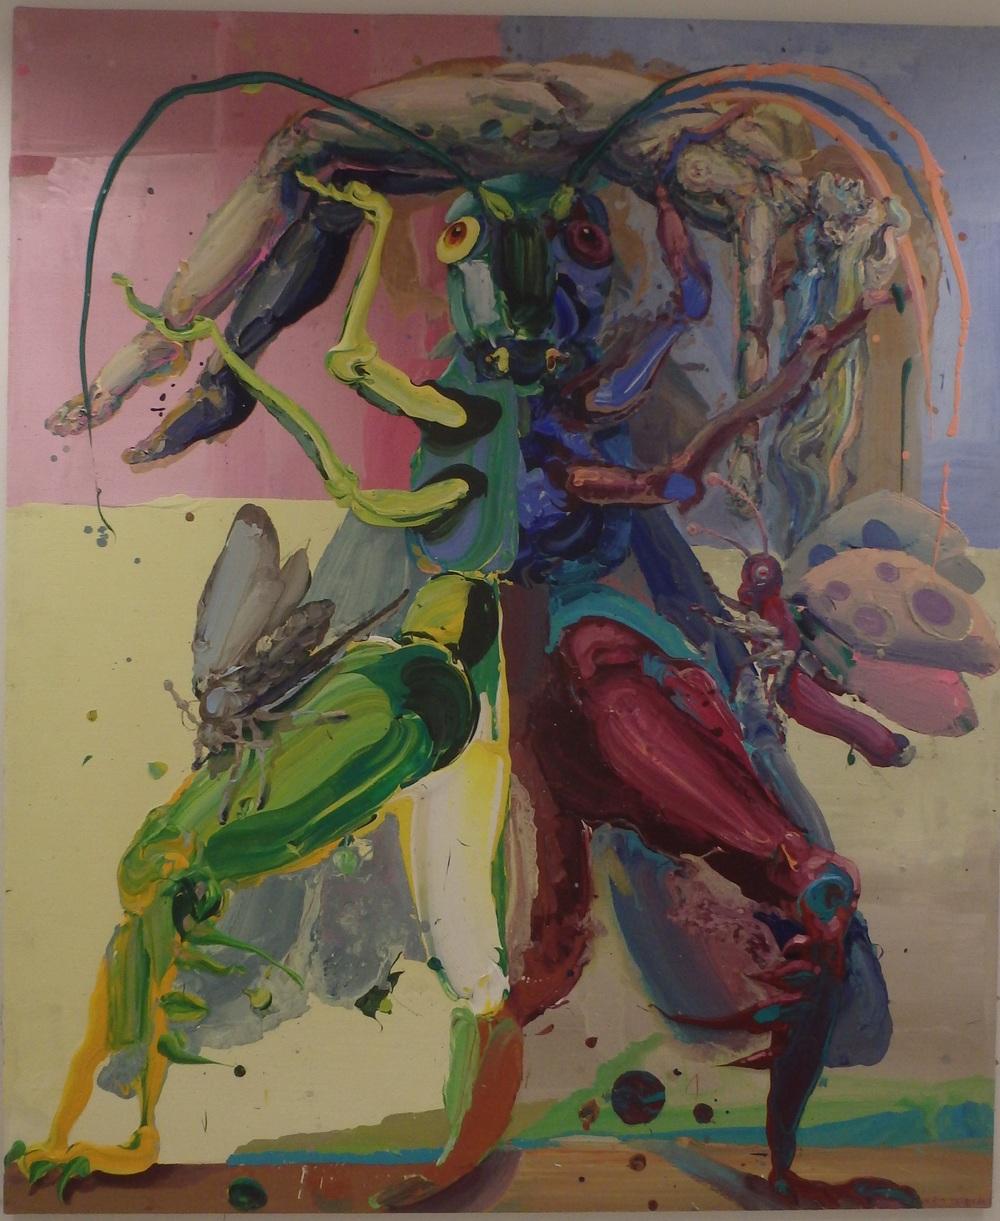 Michael Rittstein, Zdvih, 2015, plátno, akryl, 150 x 180 cm